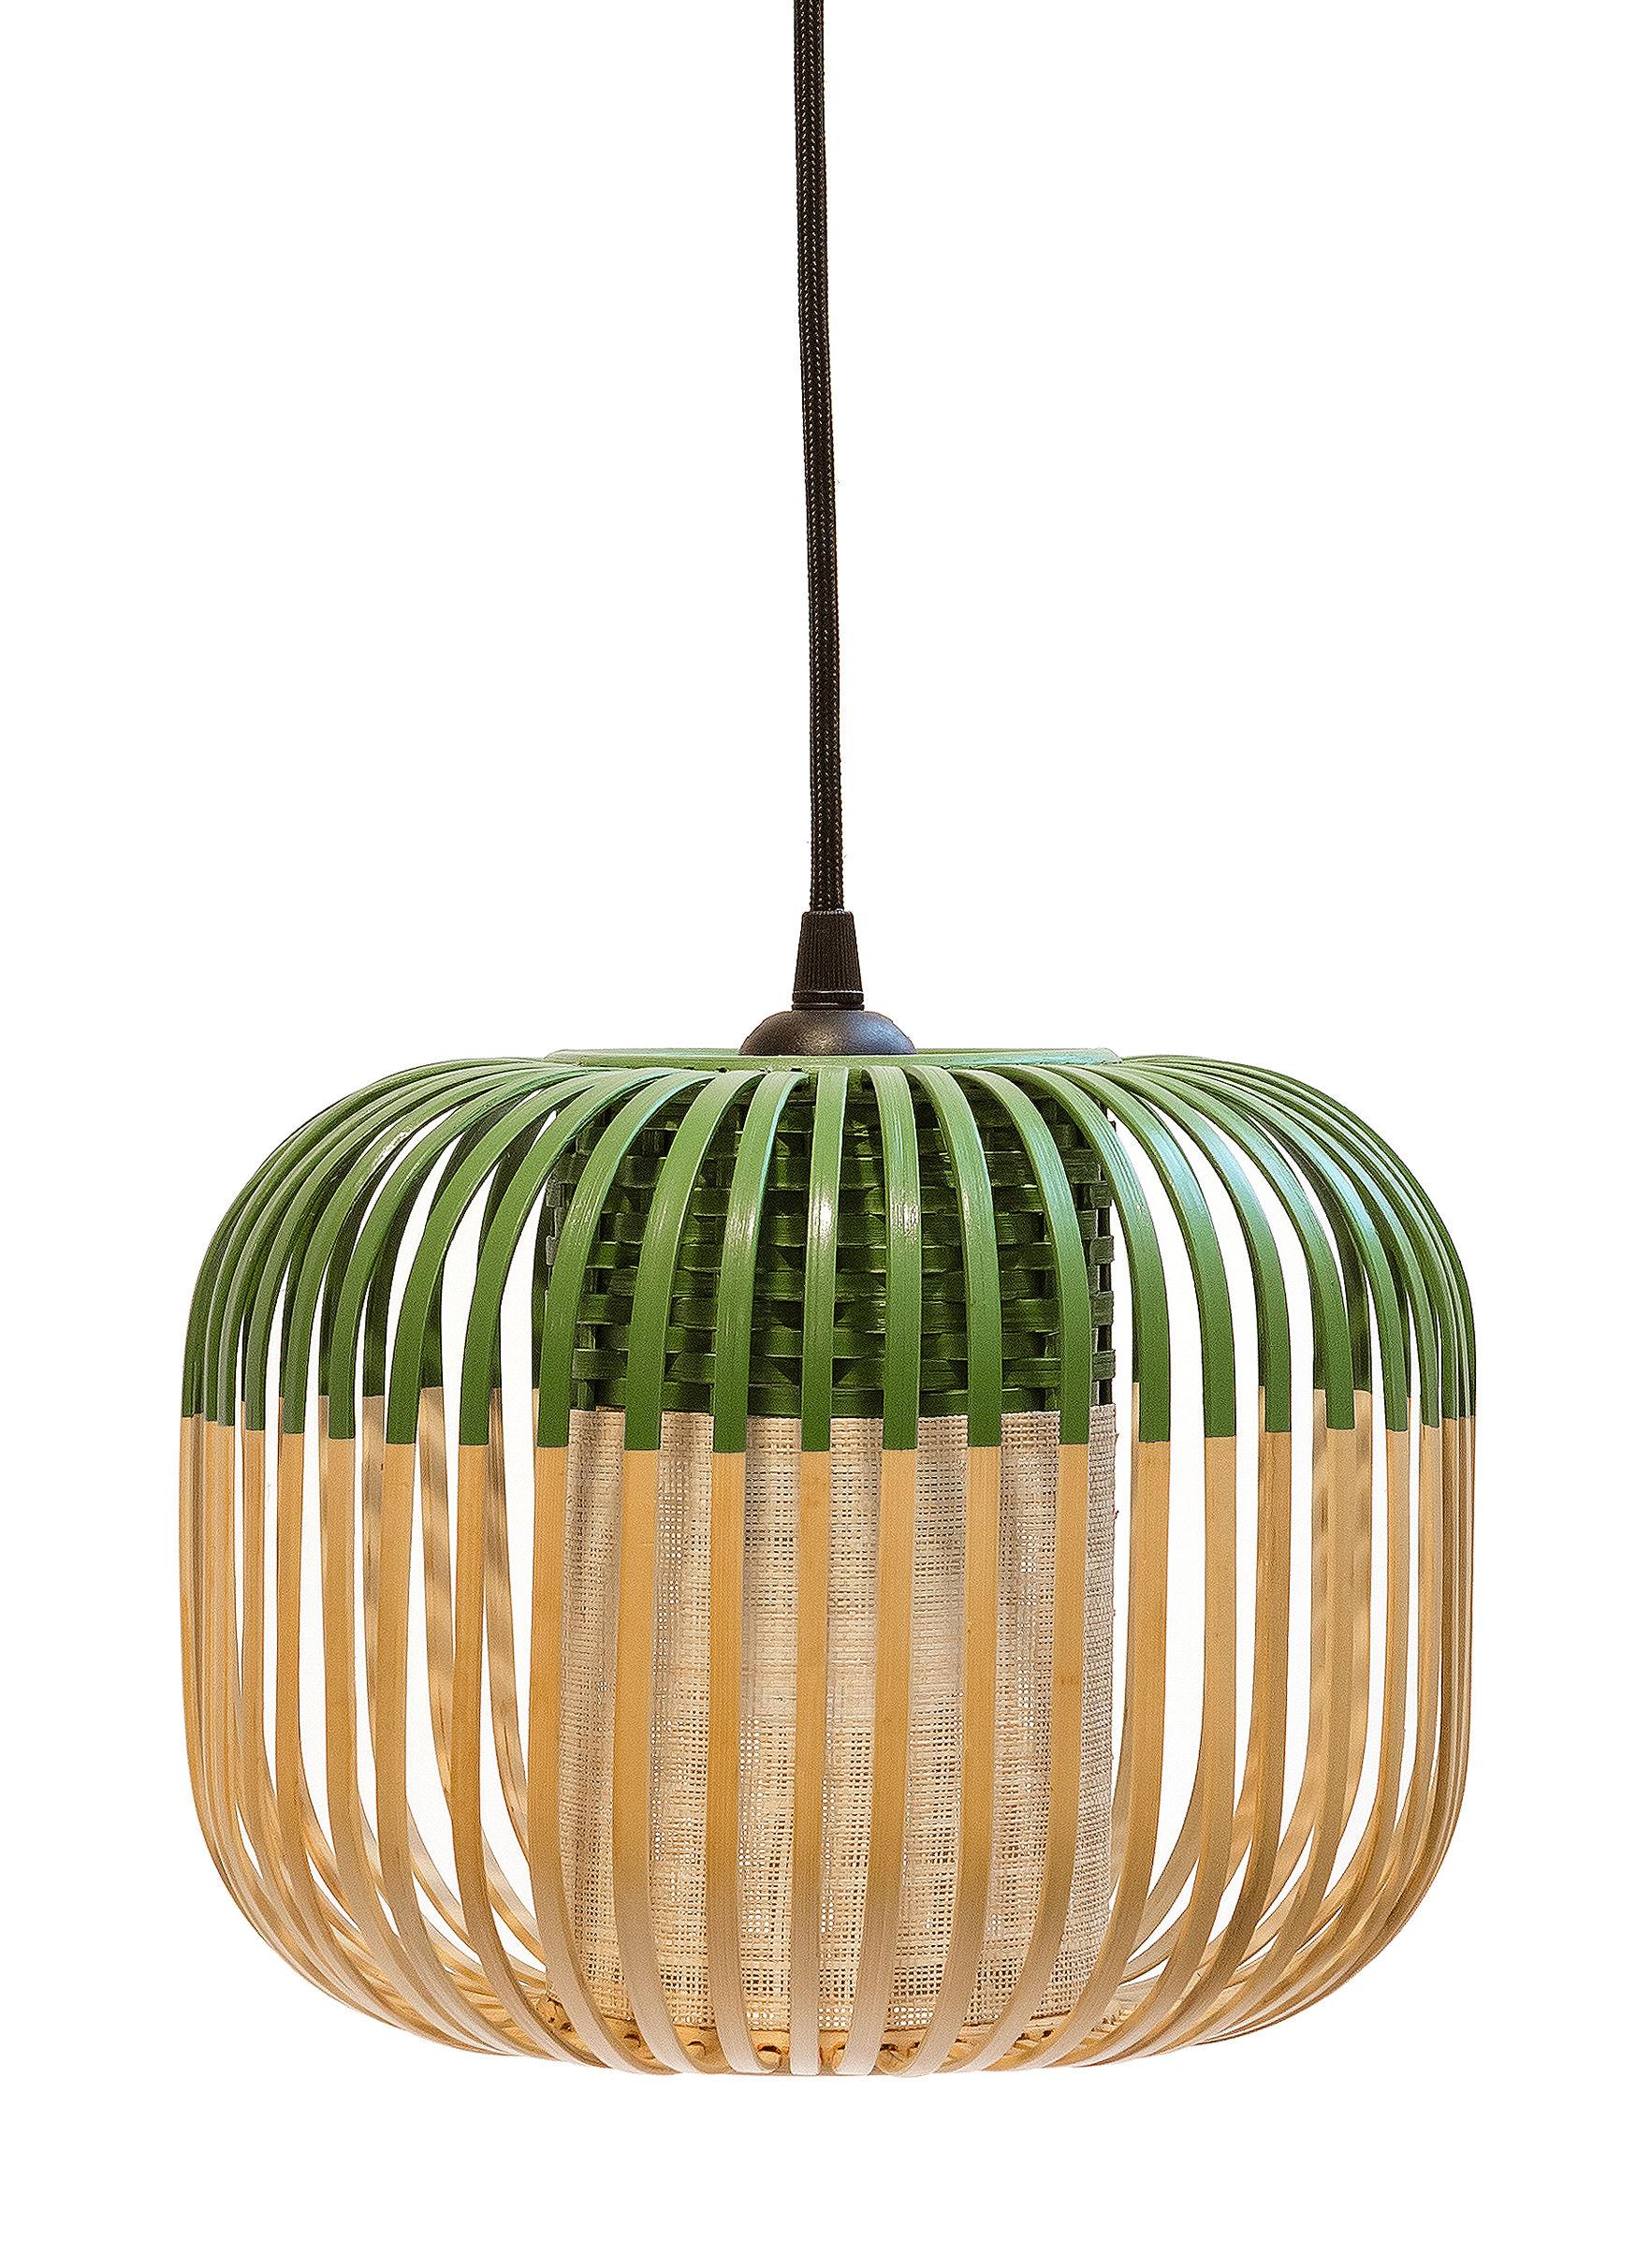 Luminaire - Suspensions - Suspension Bamboo Light XS Outdoor / H 20 x Ø 27 cm - Forestier - Vert / Naturel - Bambou naturel, Caoutchouc